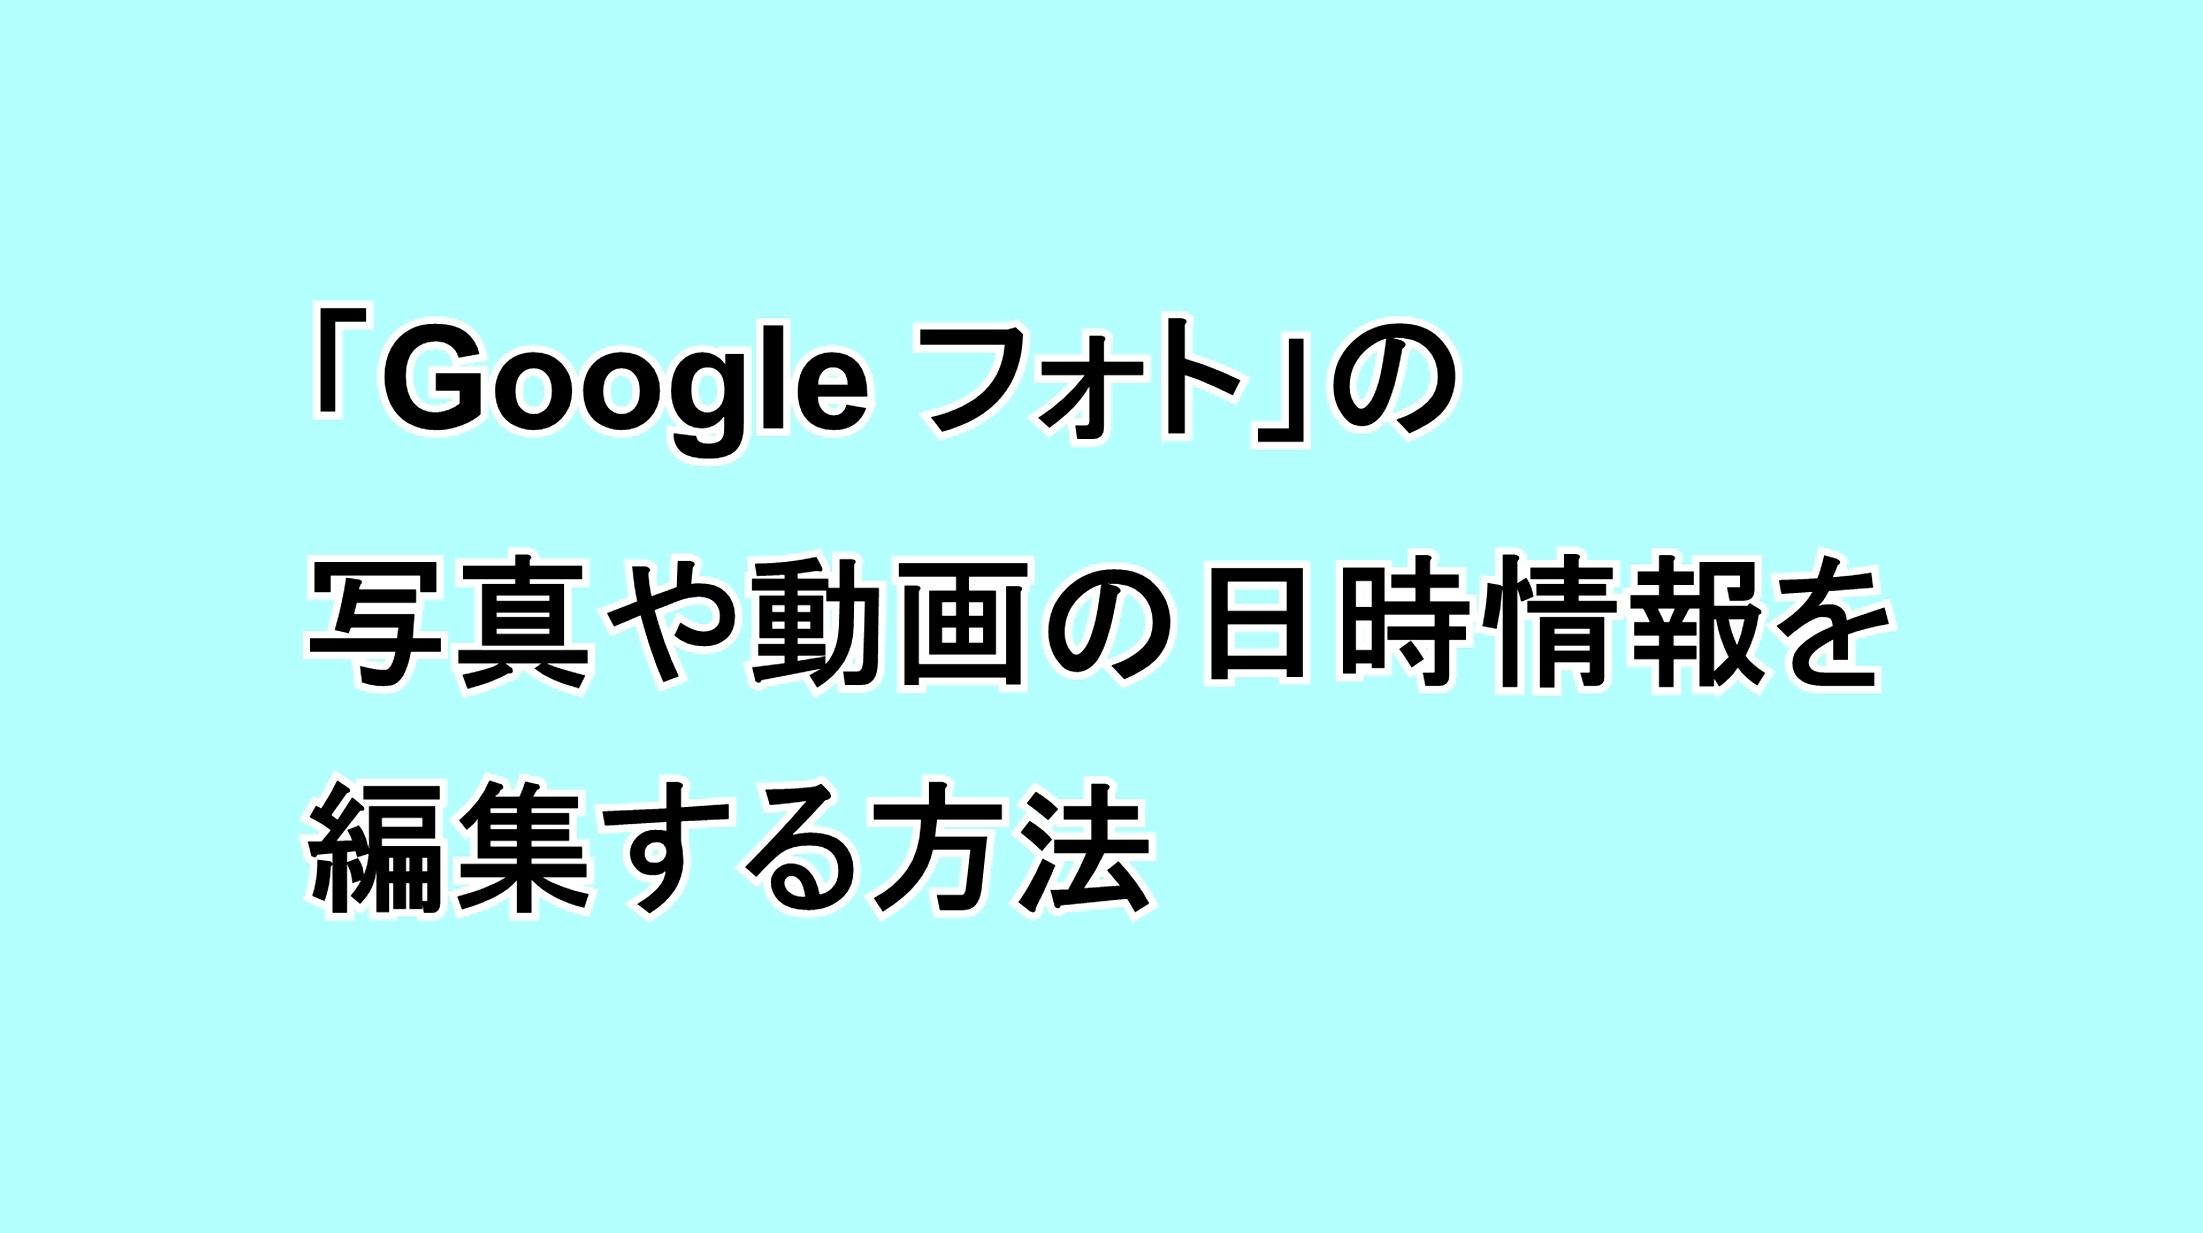 「Google フォト」の写真や動画の日時情報を編集する方法